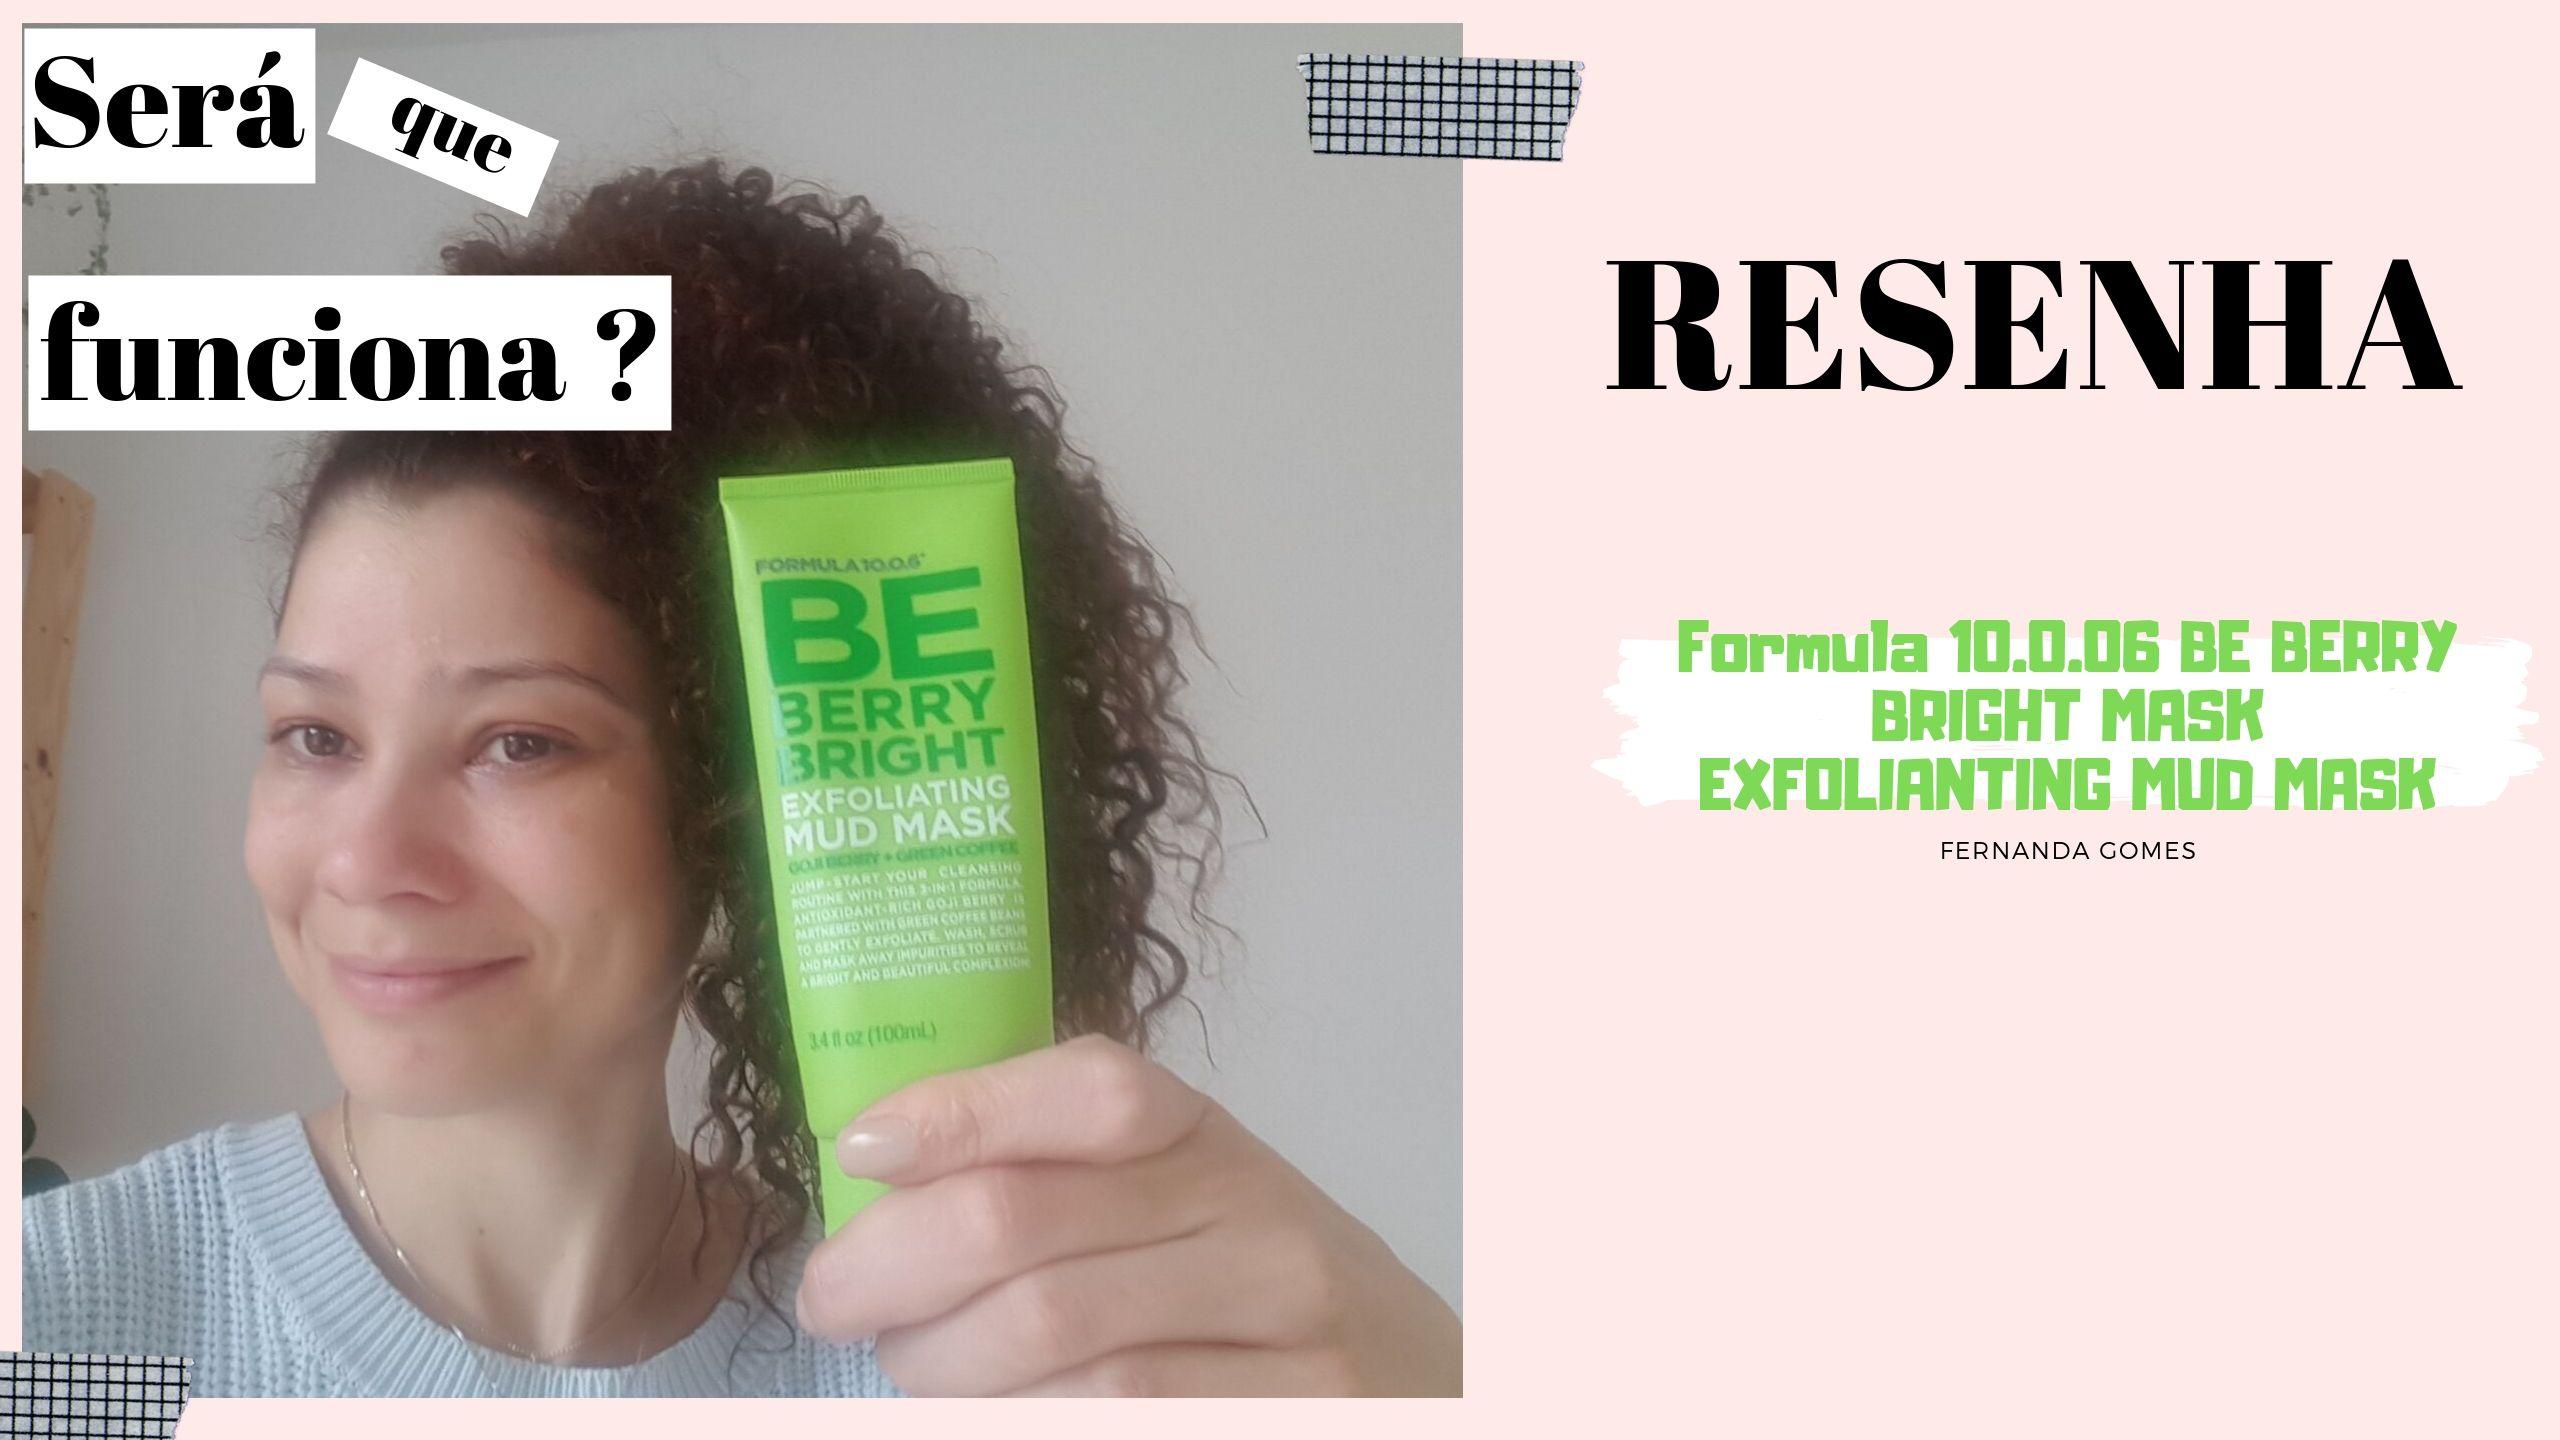 Resenha | Máscara esfoliante de argila Be Berry Bright da Fórmula 10.0.6 | Fernanda Gomes